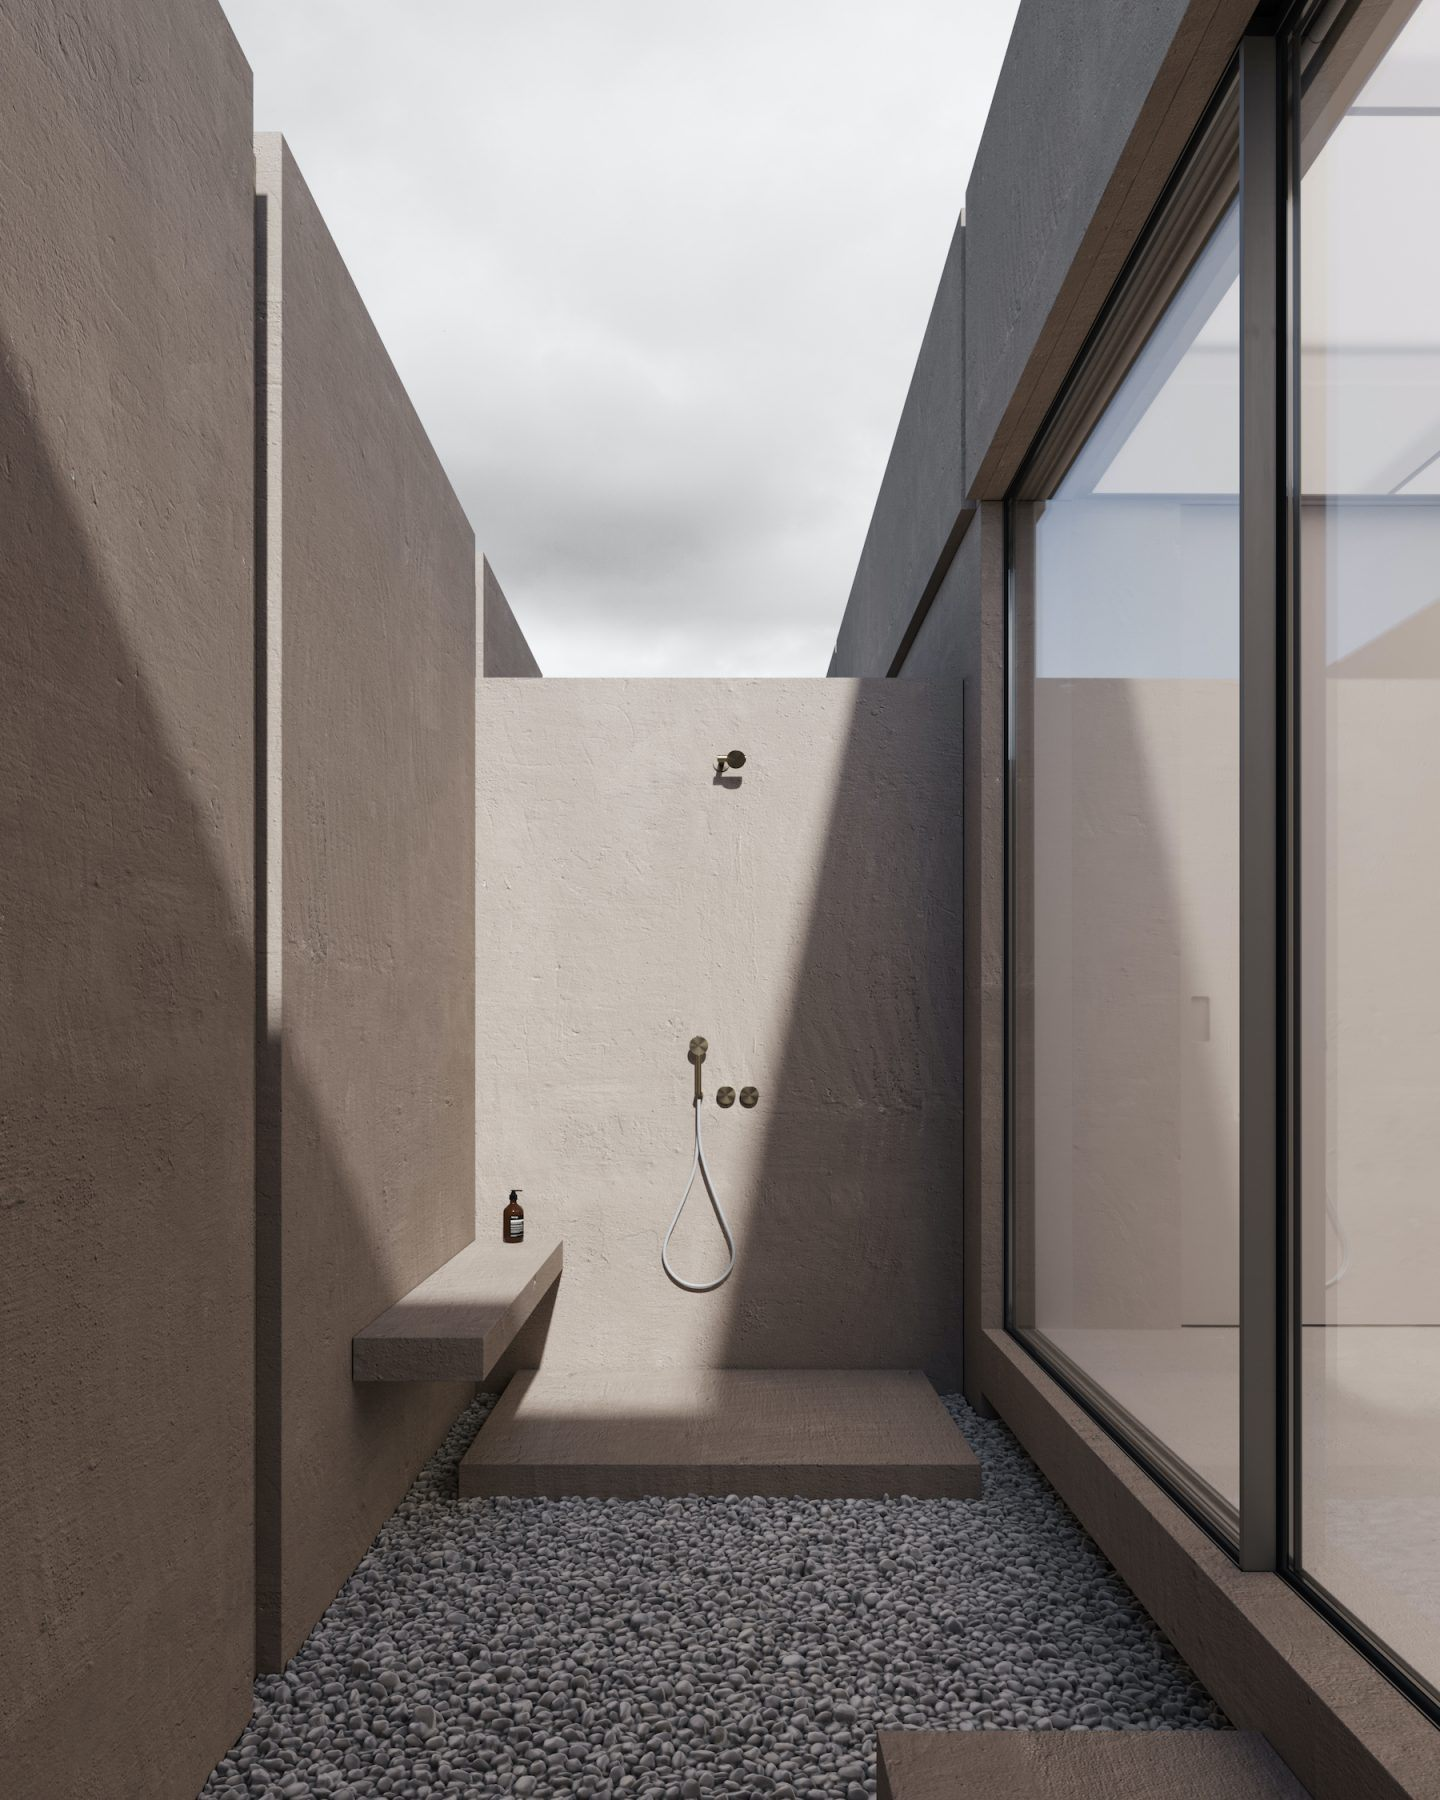 IGNANT-Design-Kanstantsin-Remez-II-Introvert-Residence-016